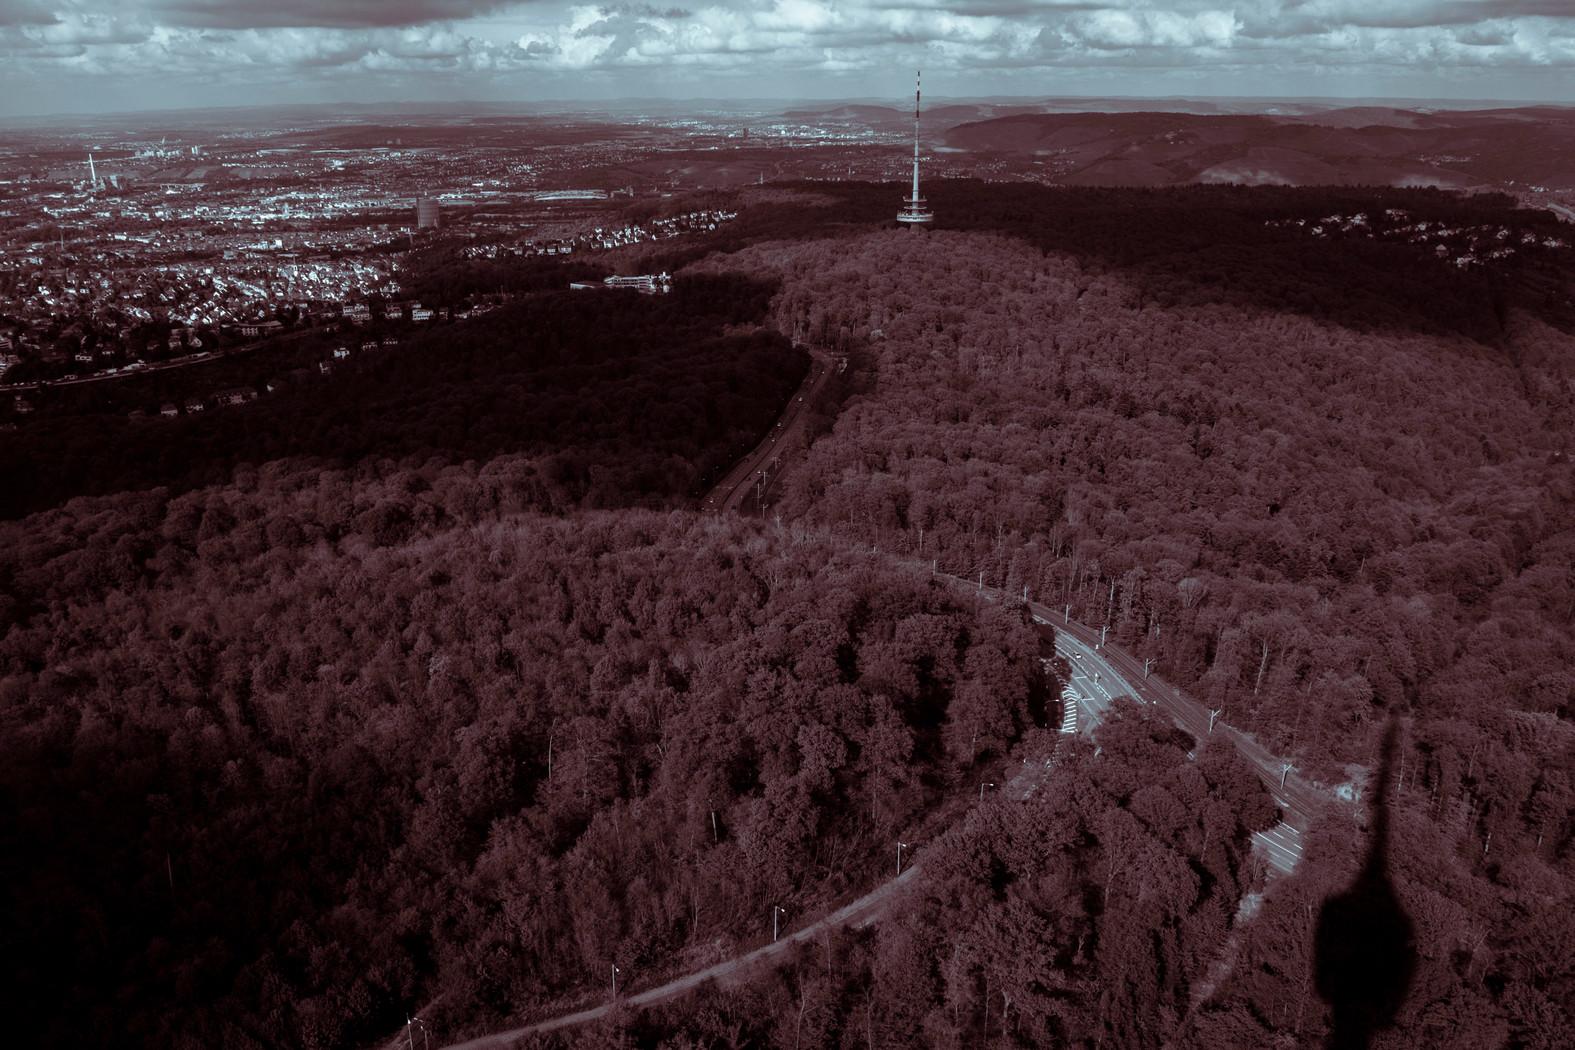 2017-05-03_Fernsehturm-4.jpg